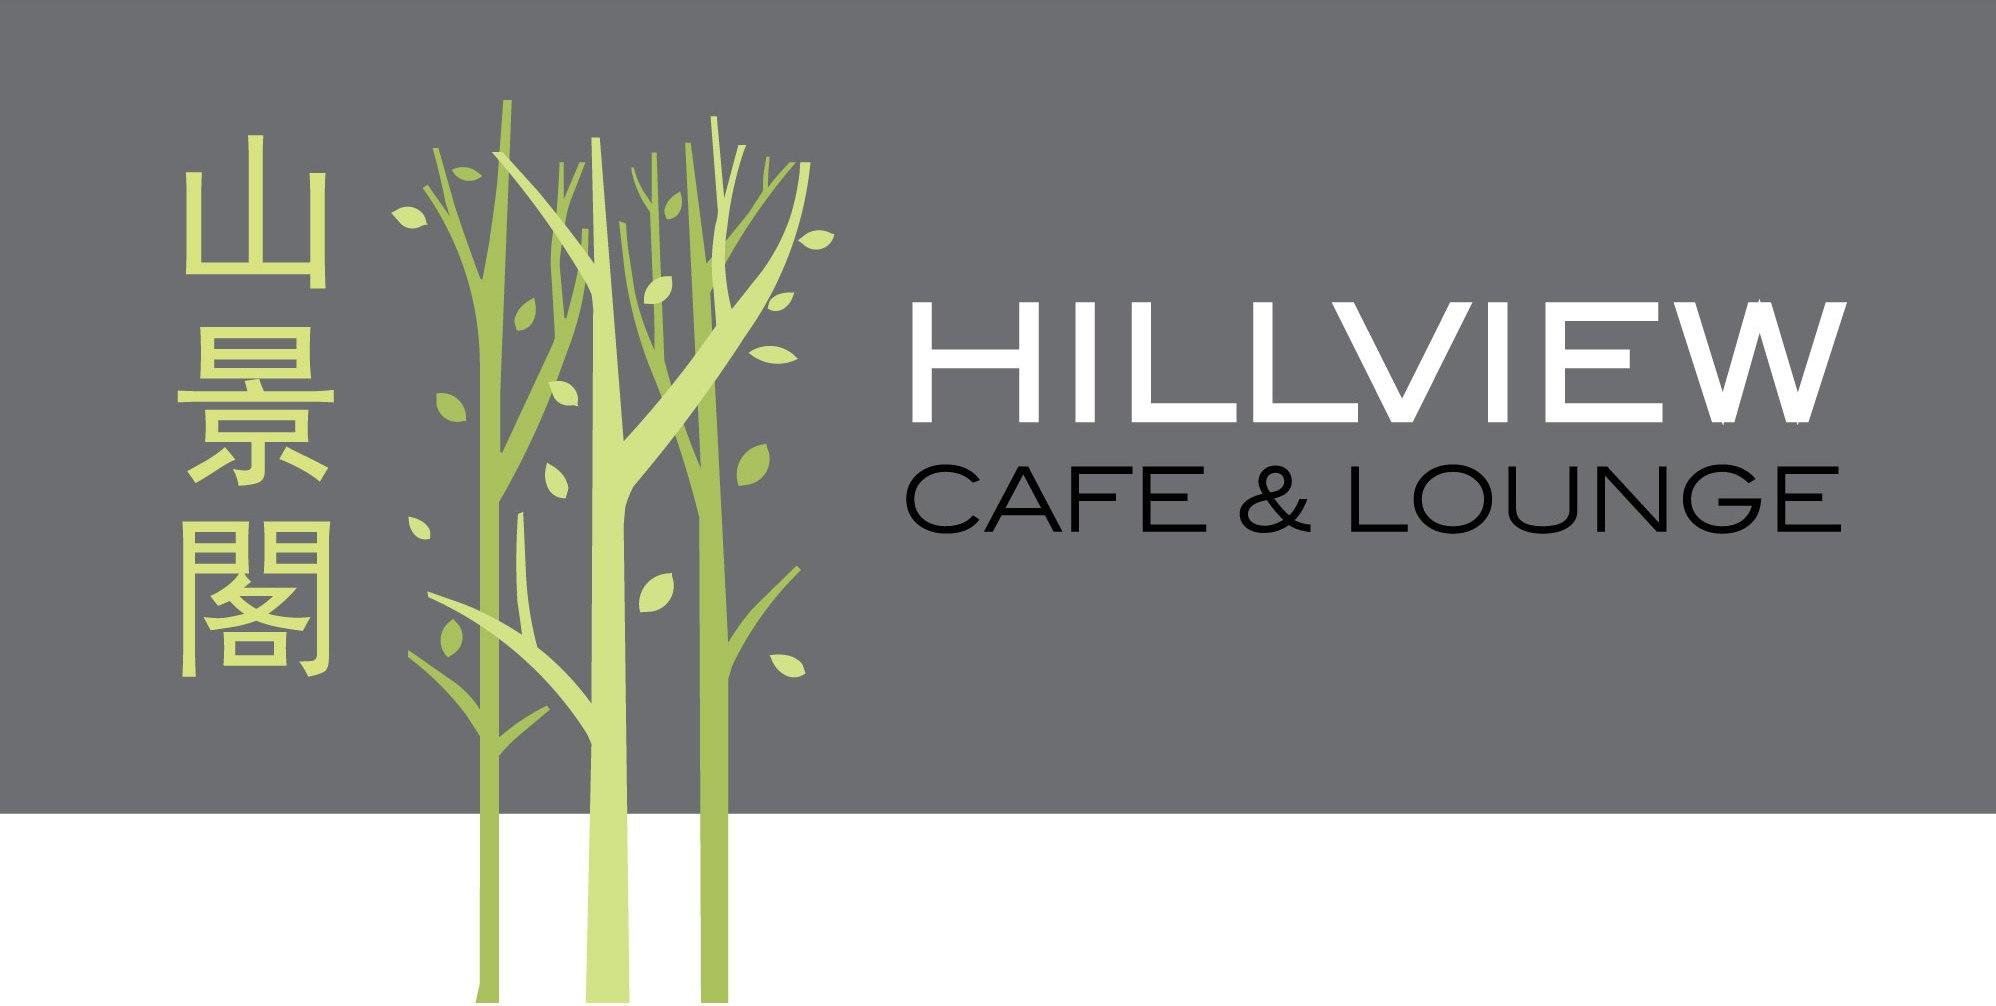 Hillview Café - Stanford Hillview Hotel